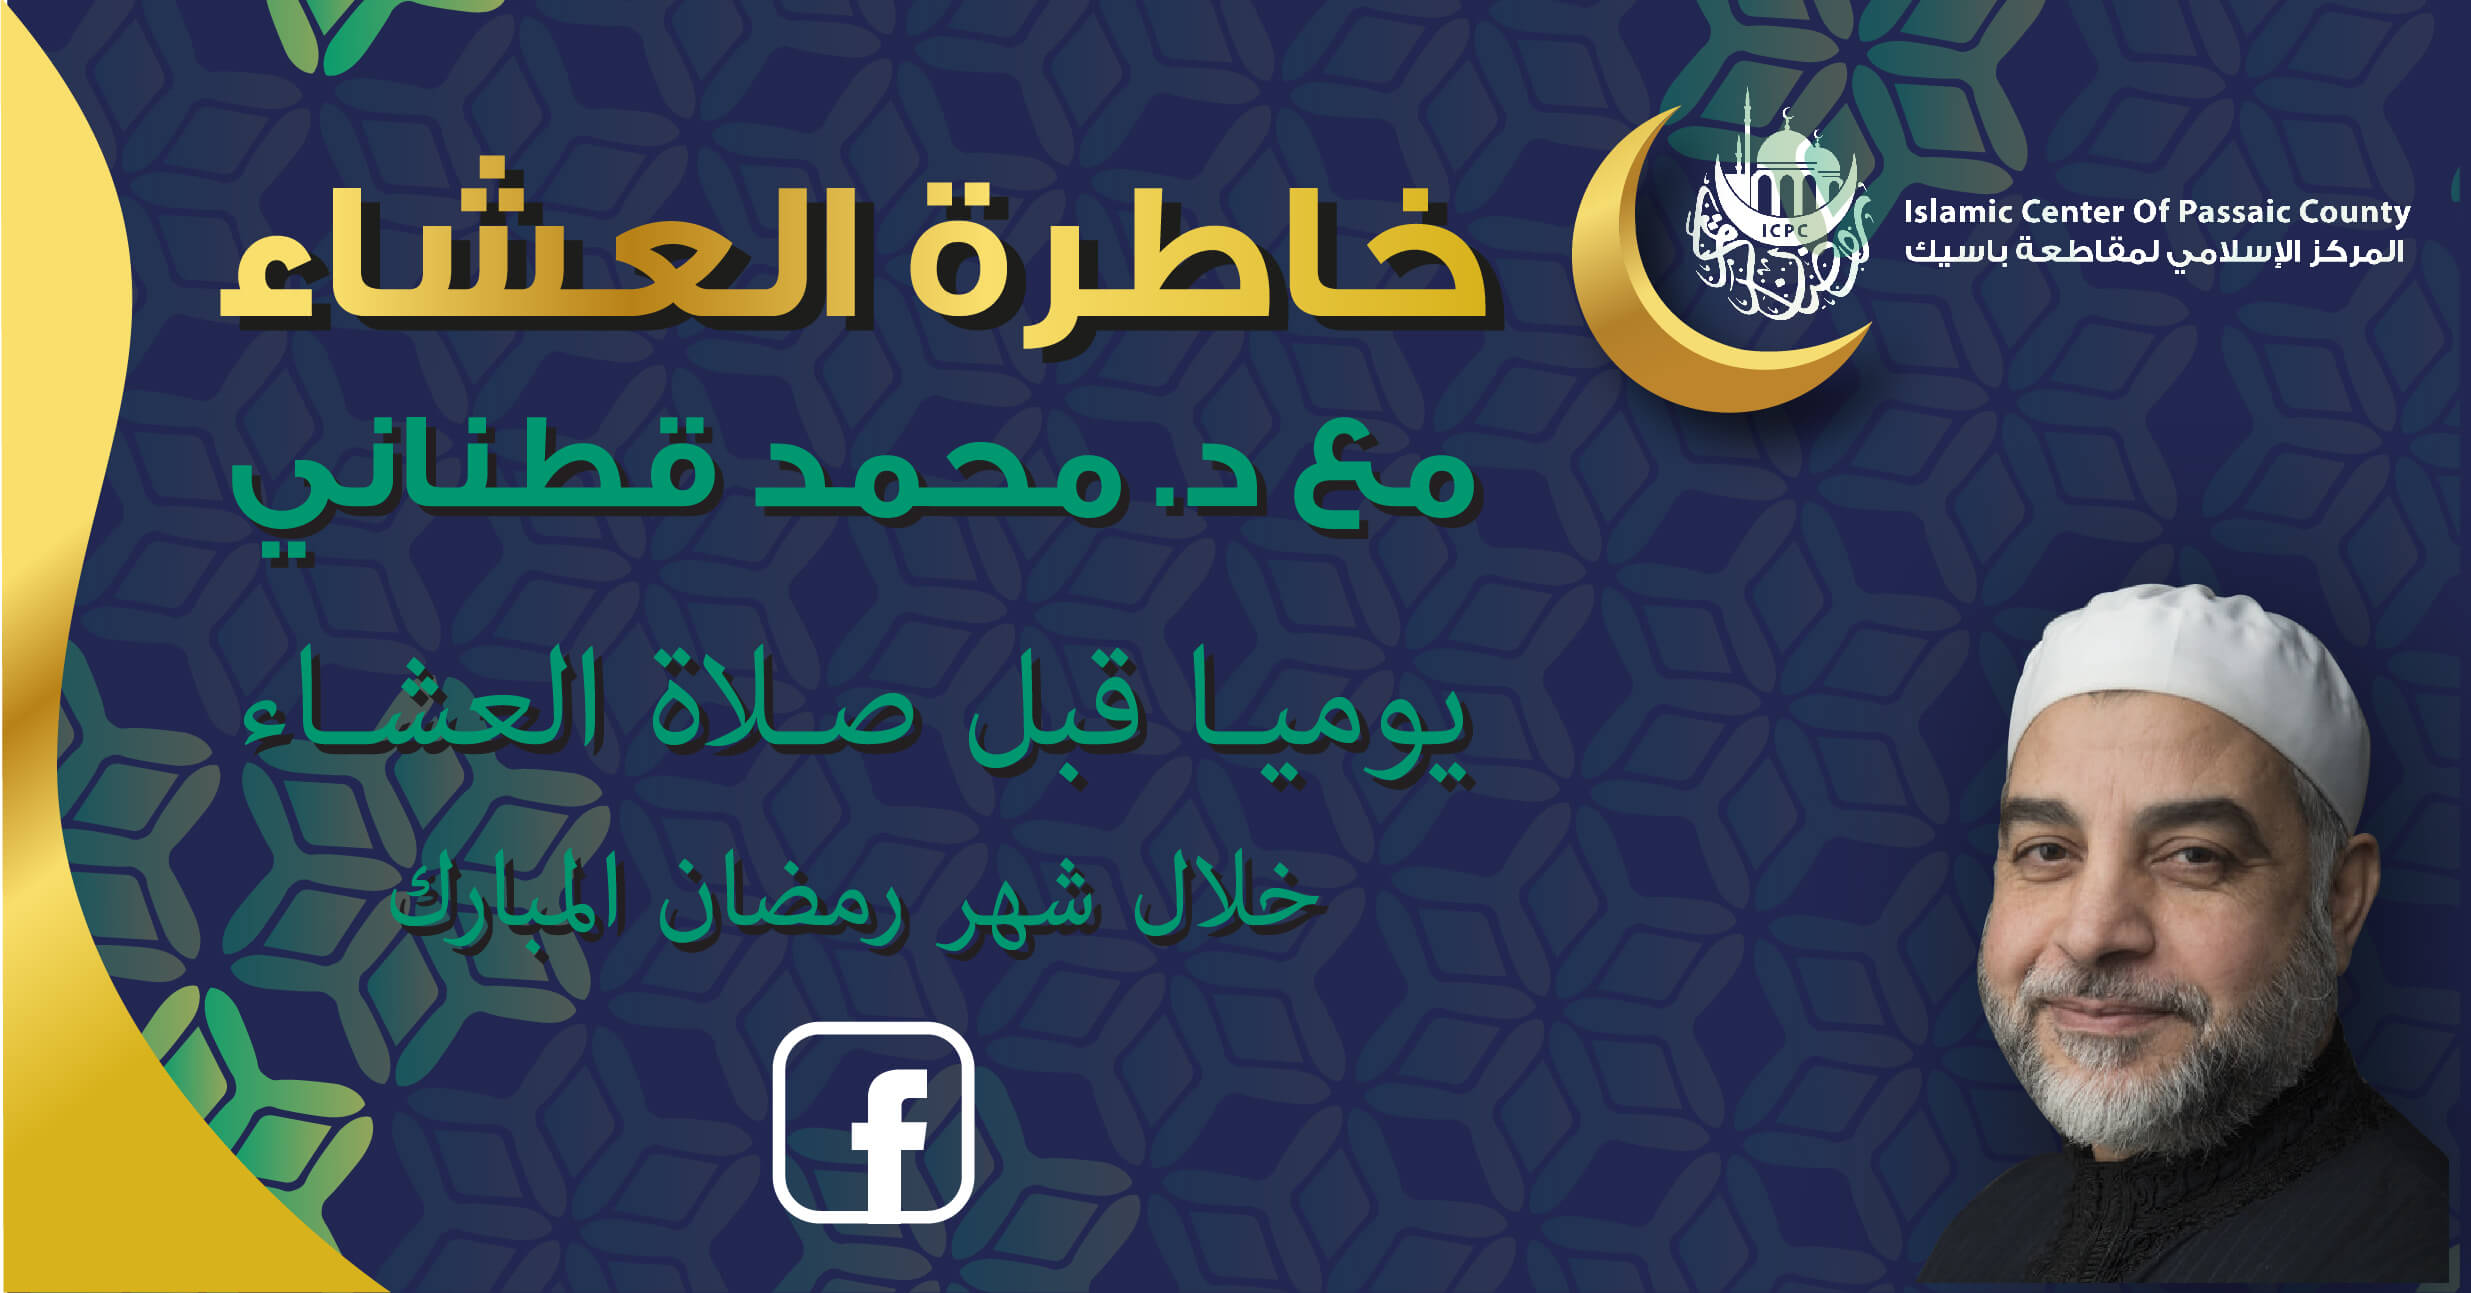 ramadan_ishafajrkhatira__socialmediabanners-04